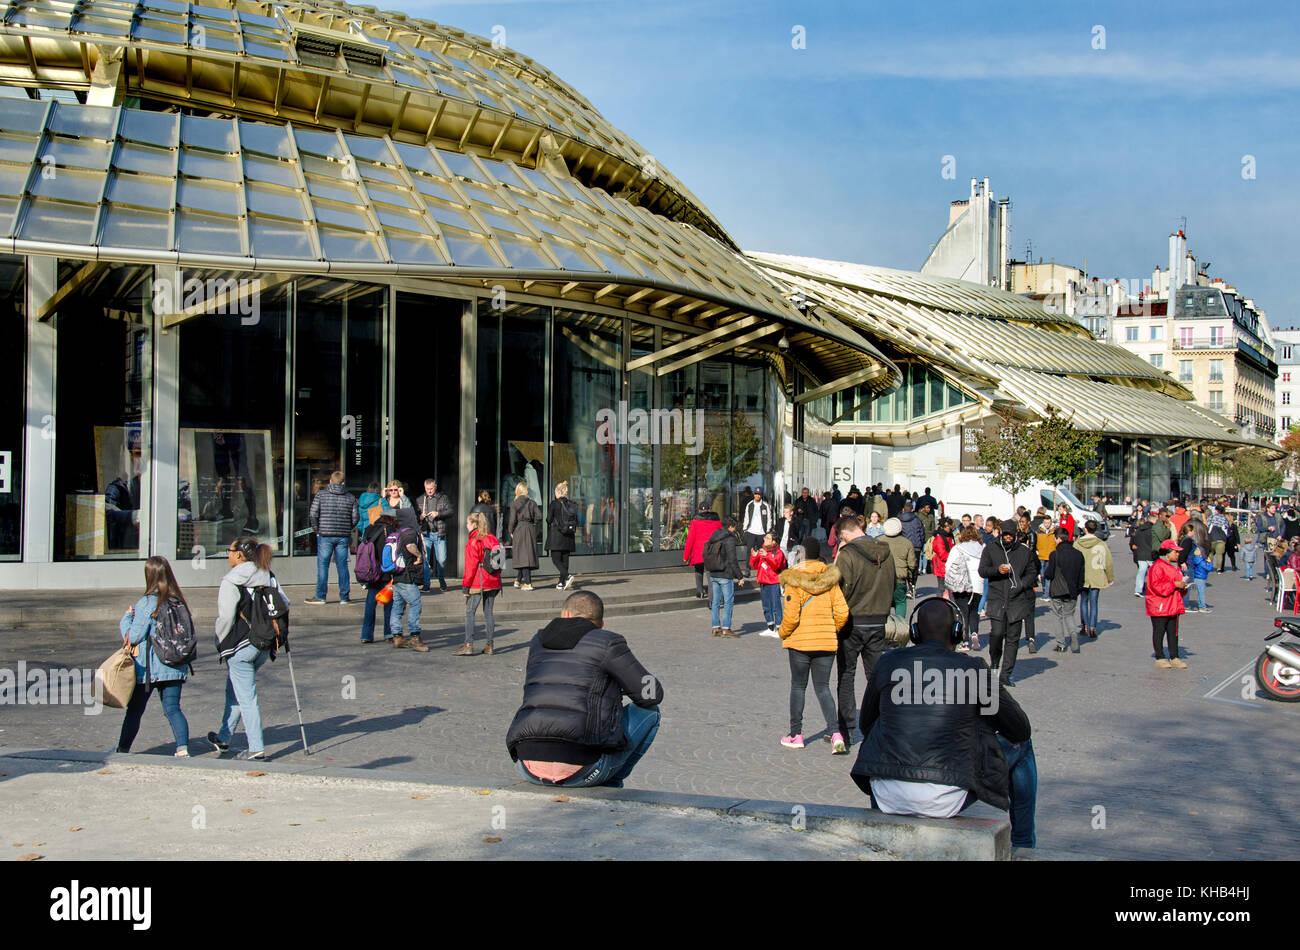 paris shopping centre stock photos paris shopping centre. Black Bedroom Furniture Sets. Home Design Ideas